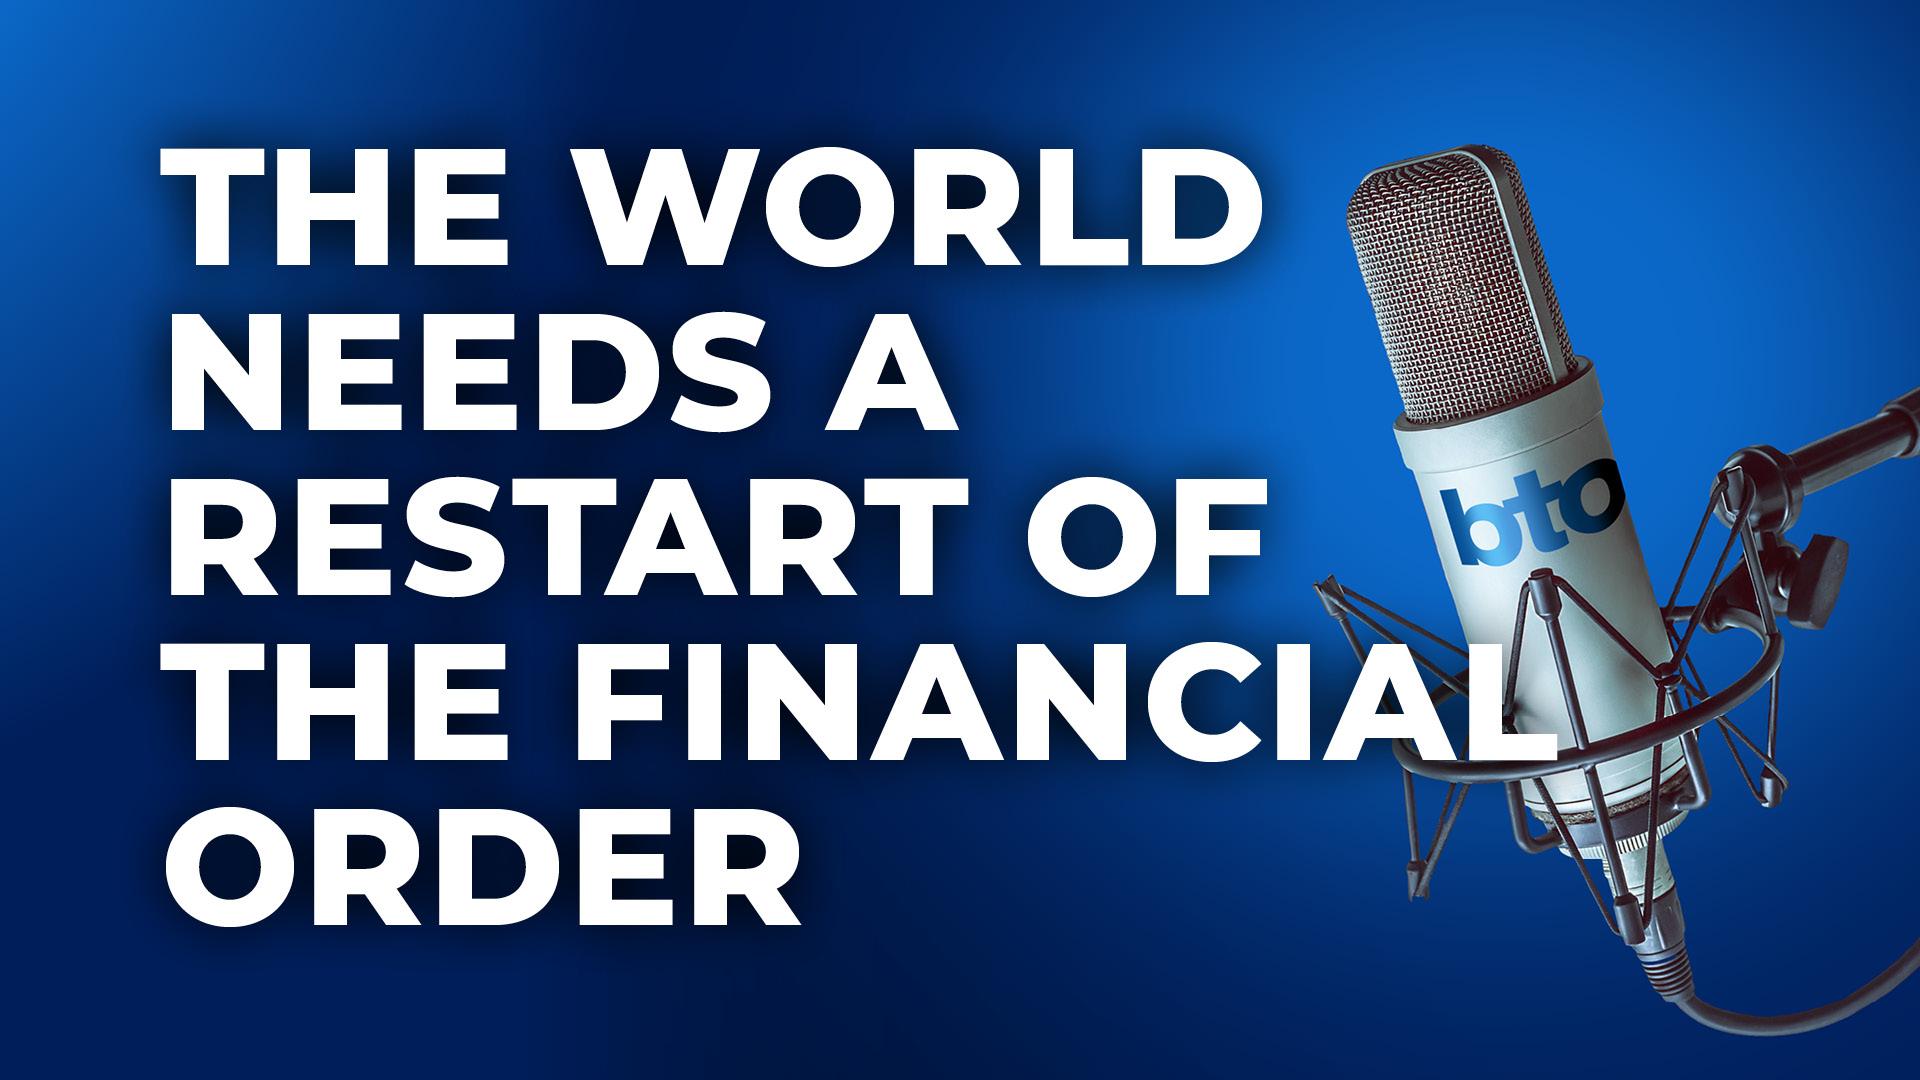 The world needs a restart of the financial order